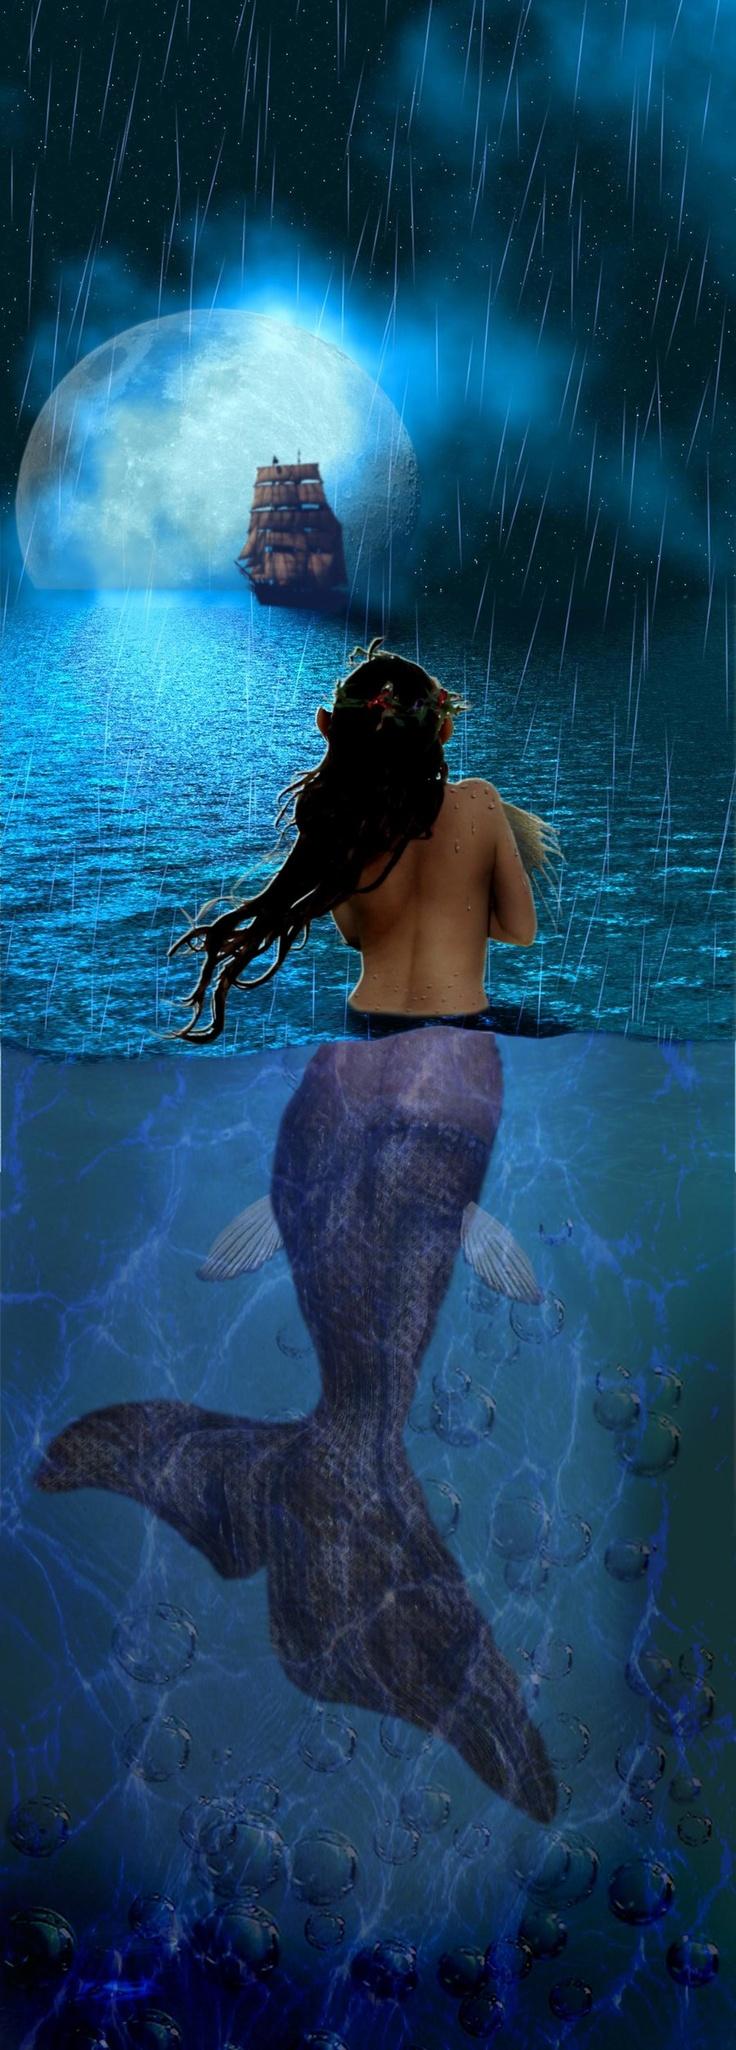 *Valedhelven on deviantART: Mystical Mermaids, Deviantart, Sirens, Mermaids Sirens, Art Mermaids, Fantasy Mermaid